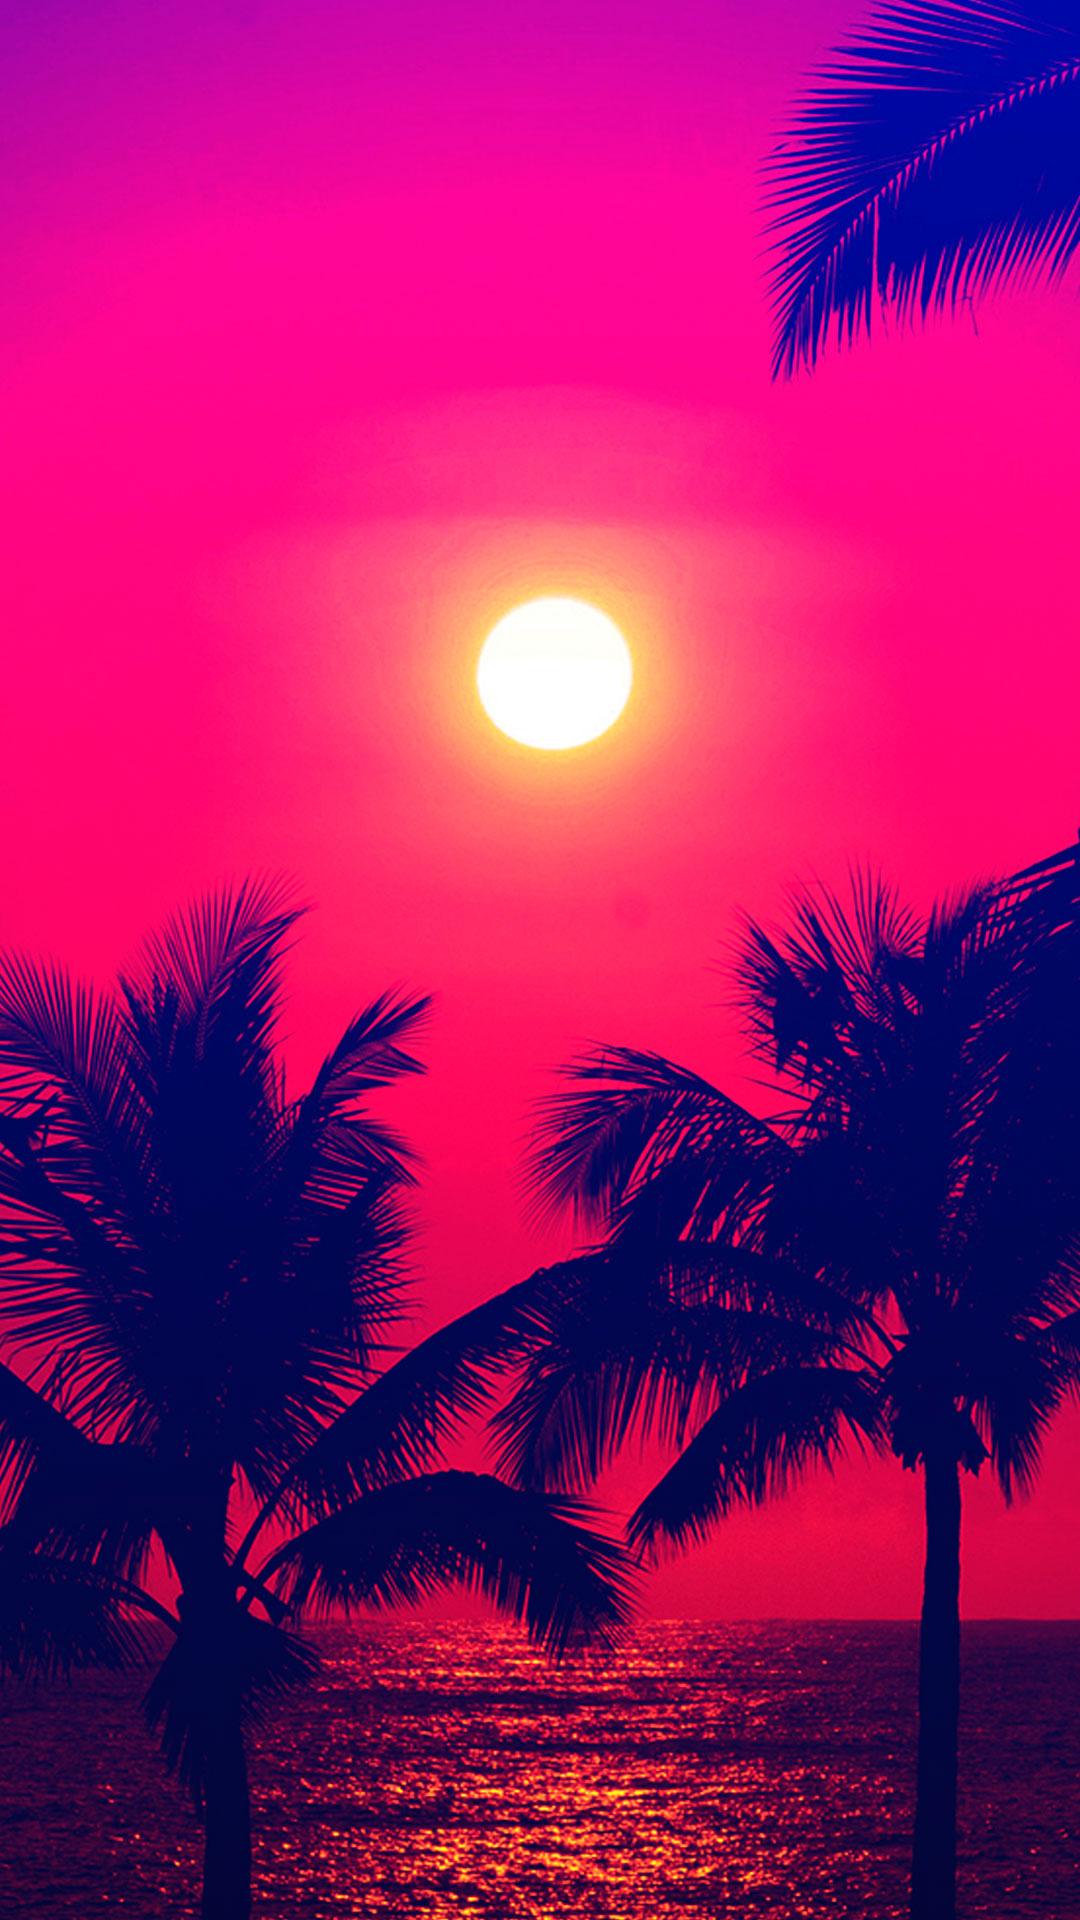 iPhone wallpaper sunset1 Sunset